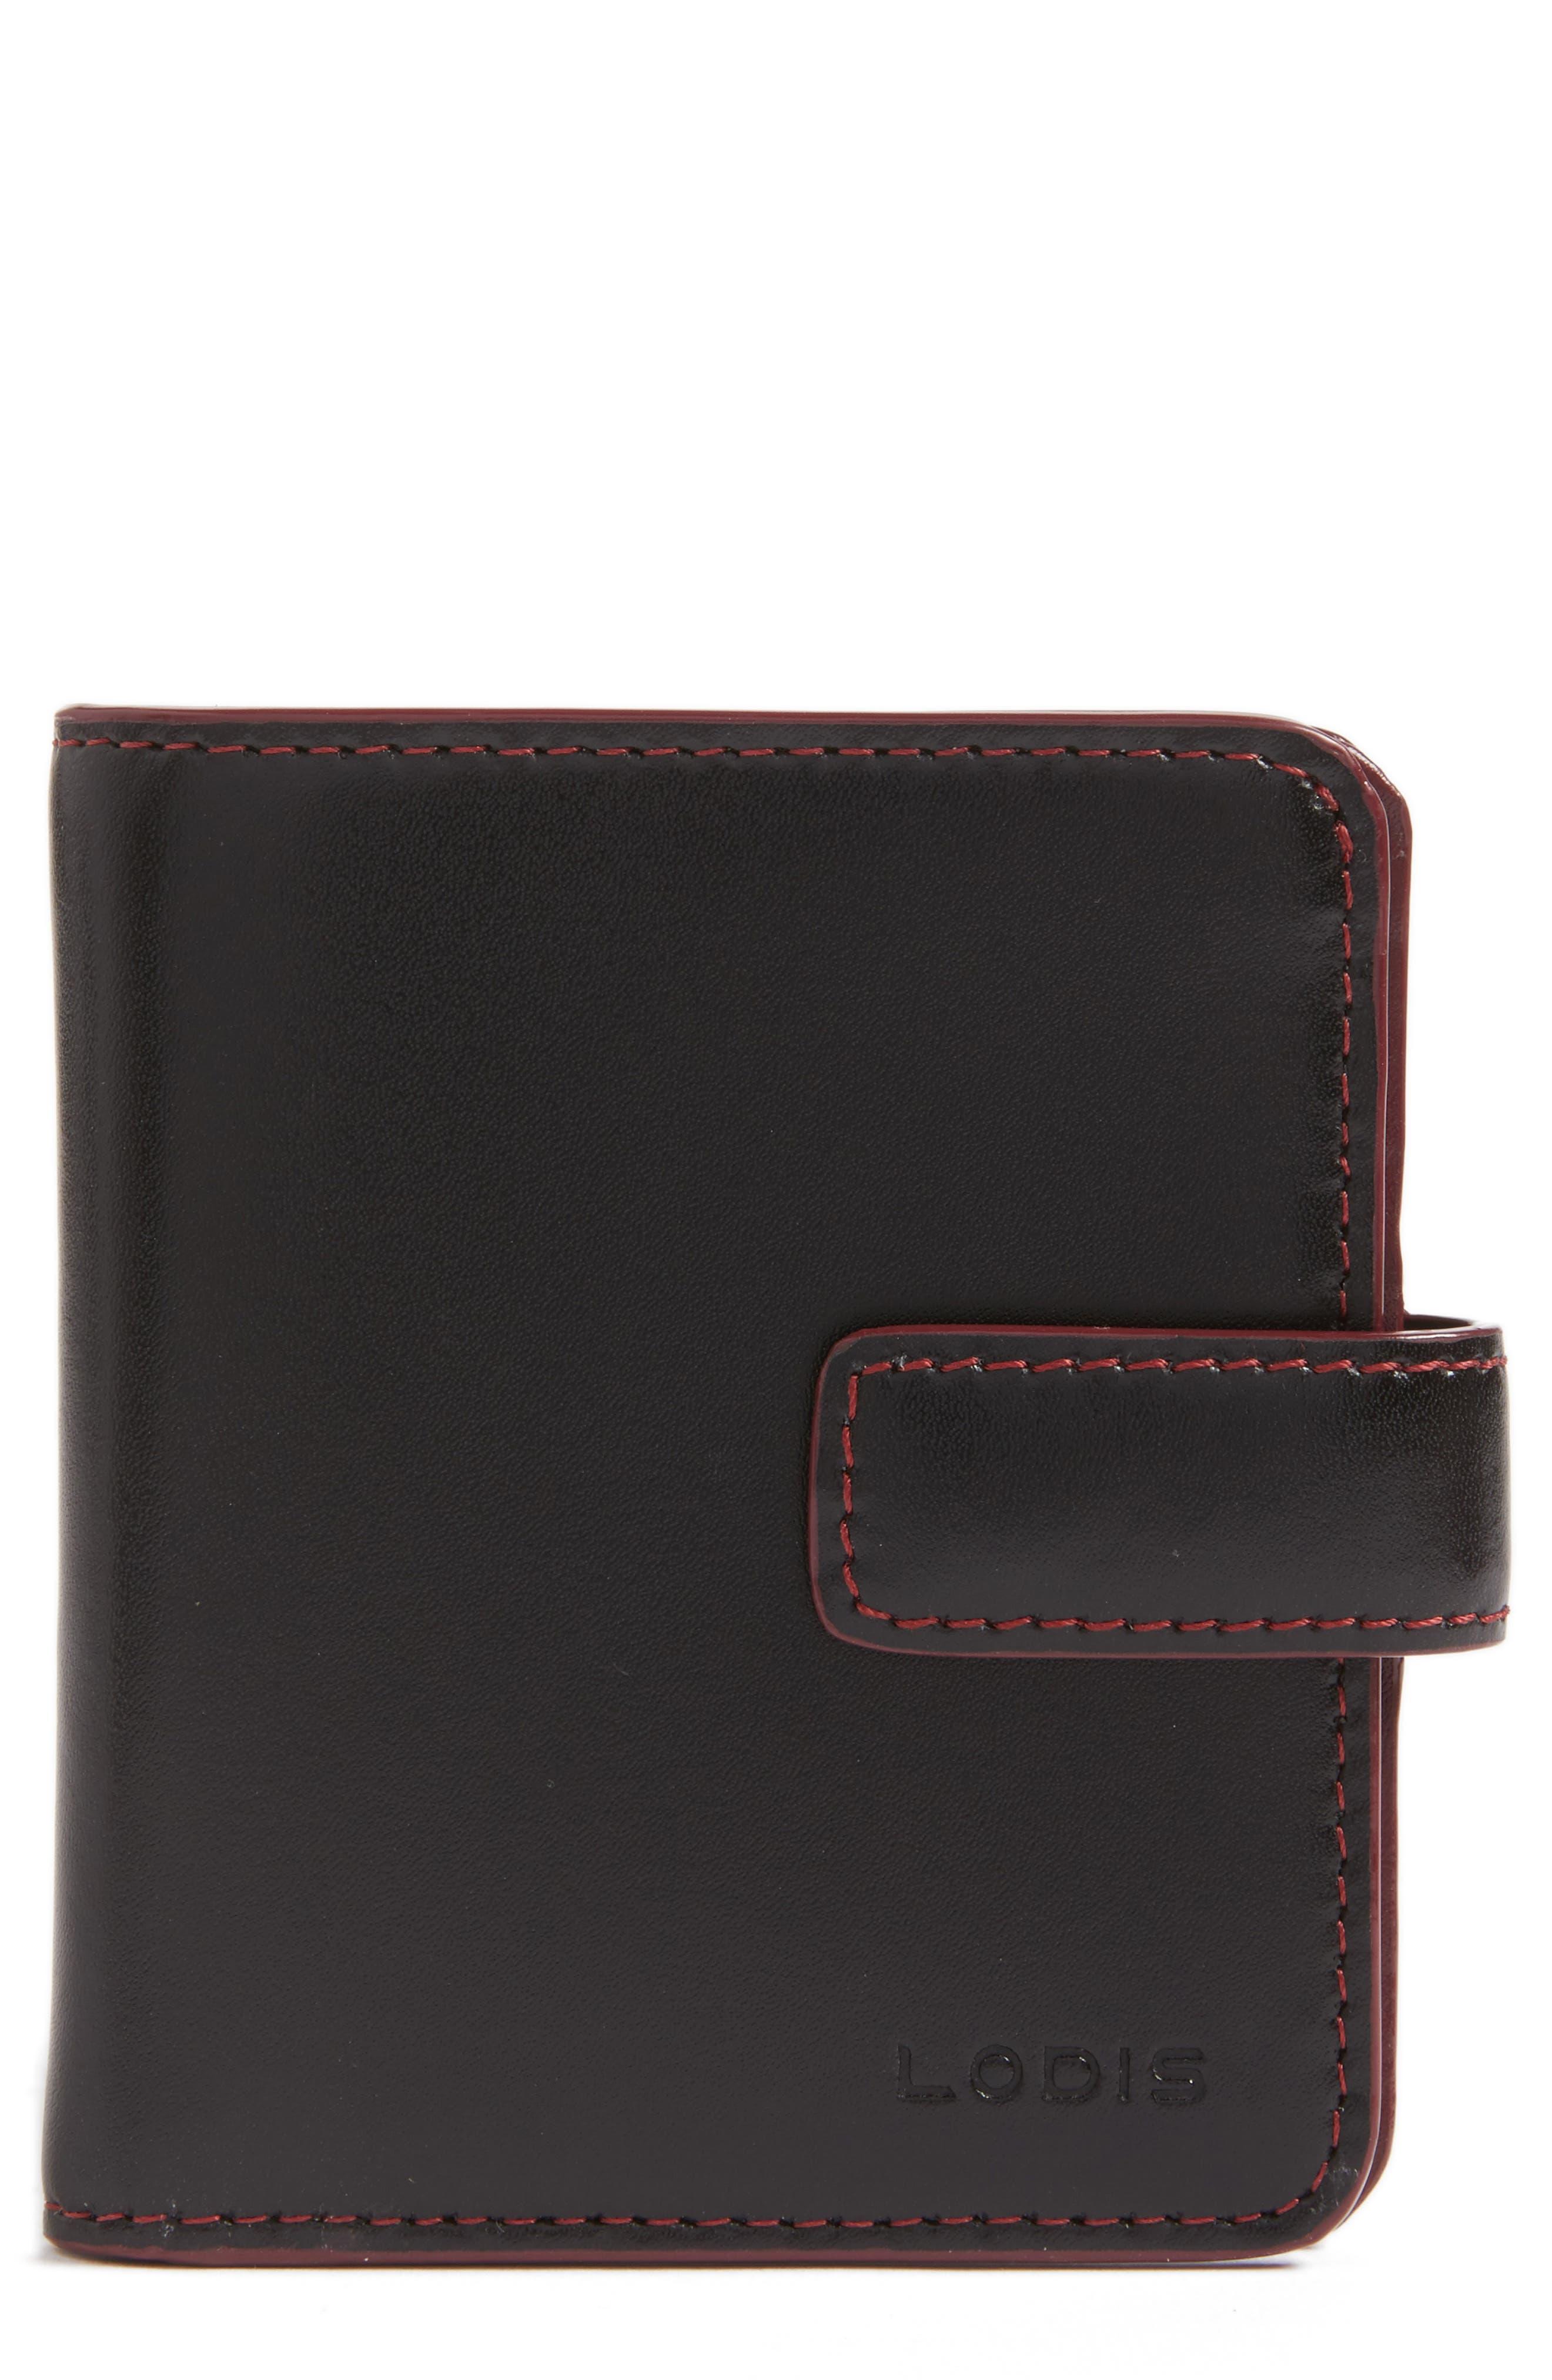 Lodis Petite Audrey RFID Leather Wallet